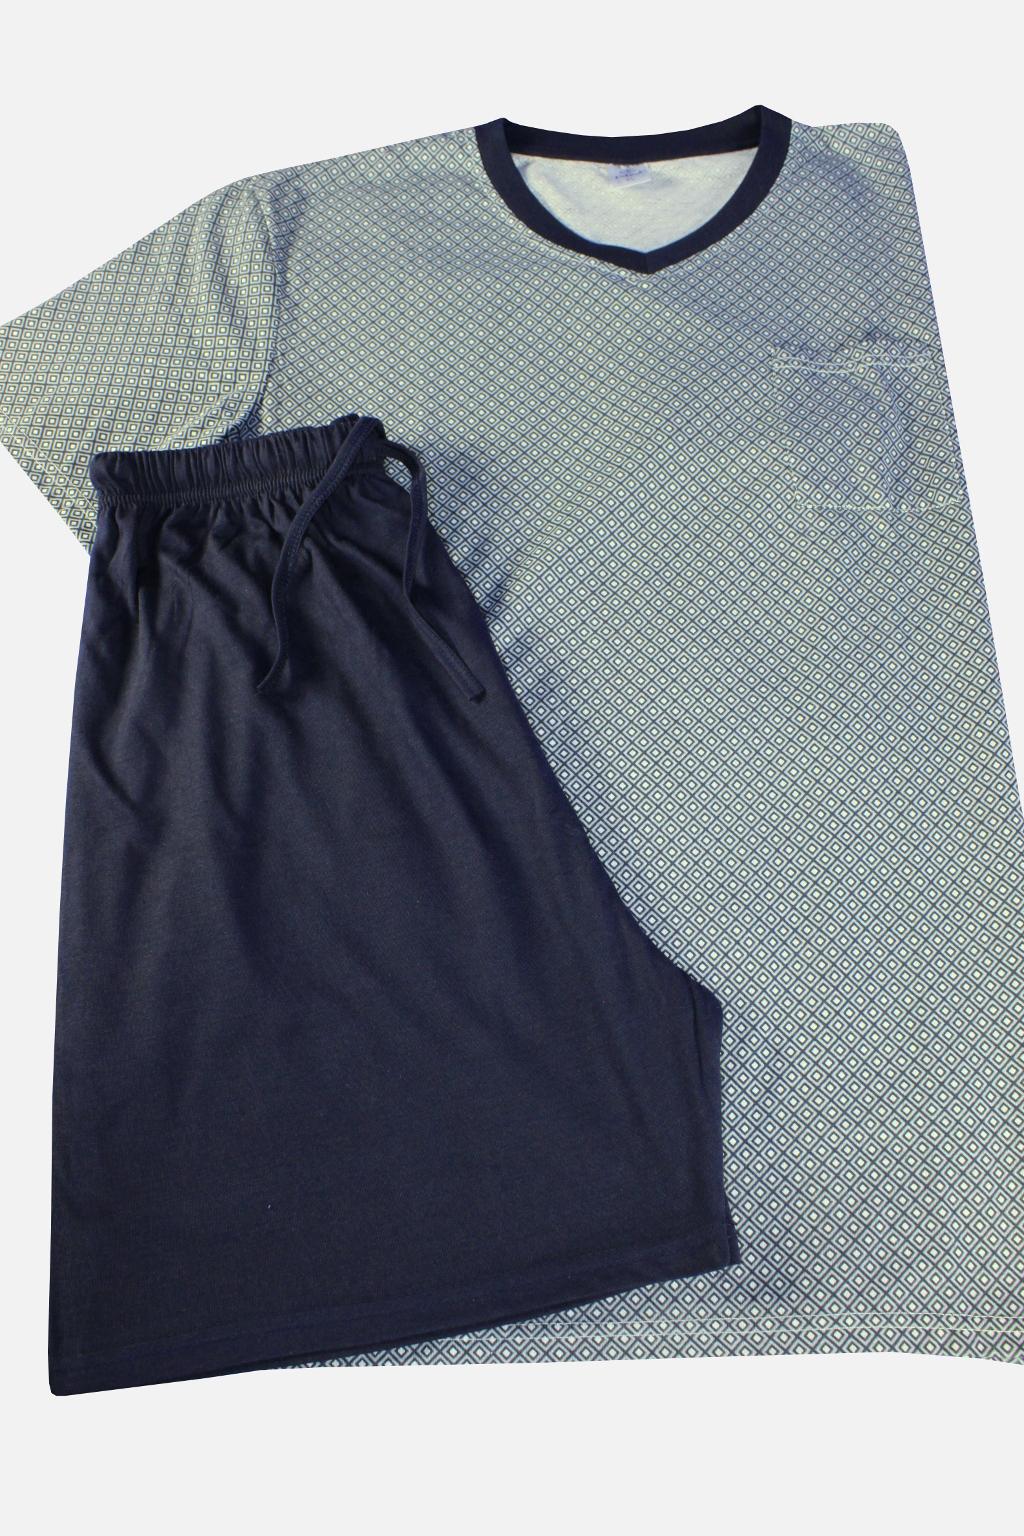 Javon pánské pyžamo XXL tmavě modrá